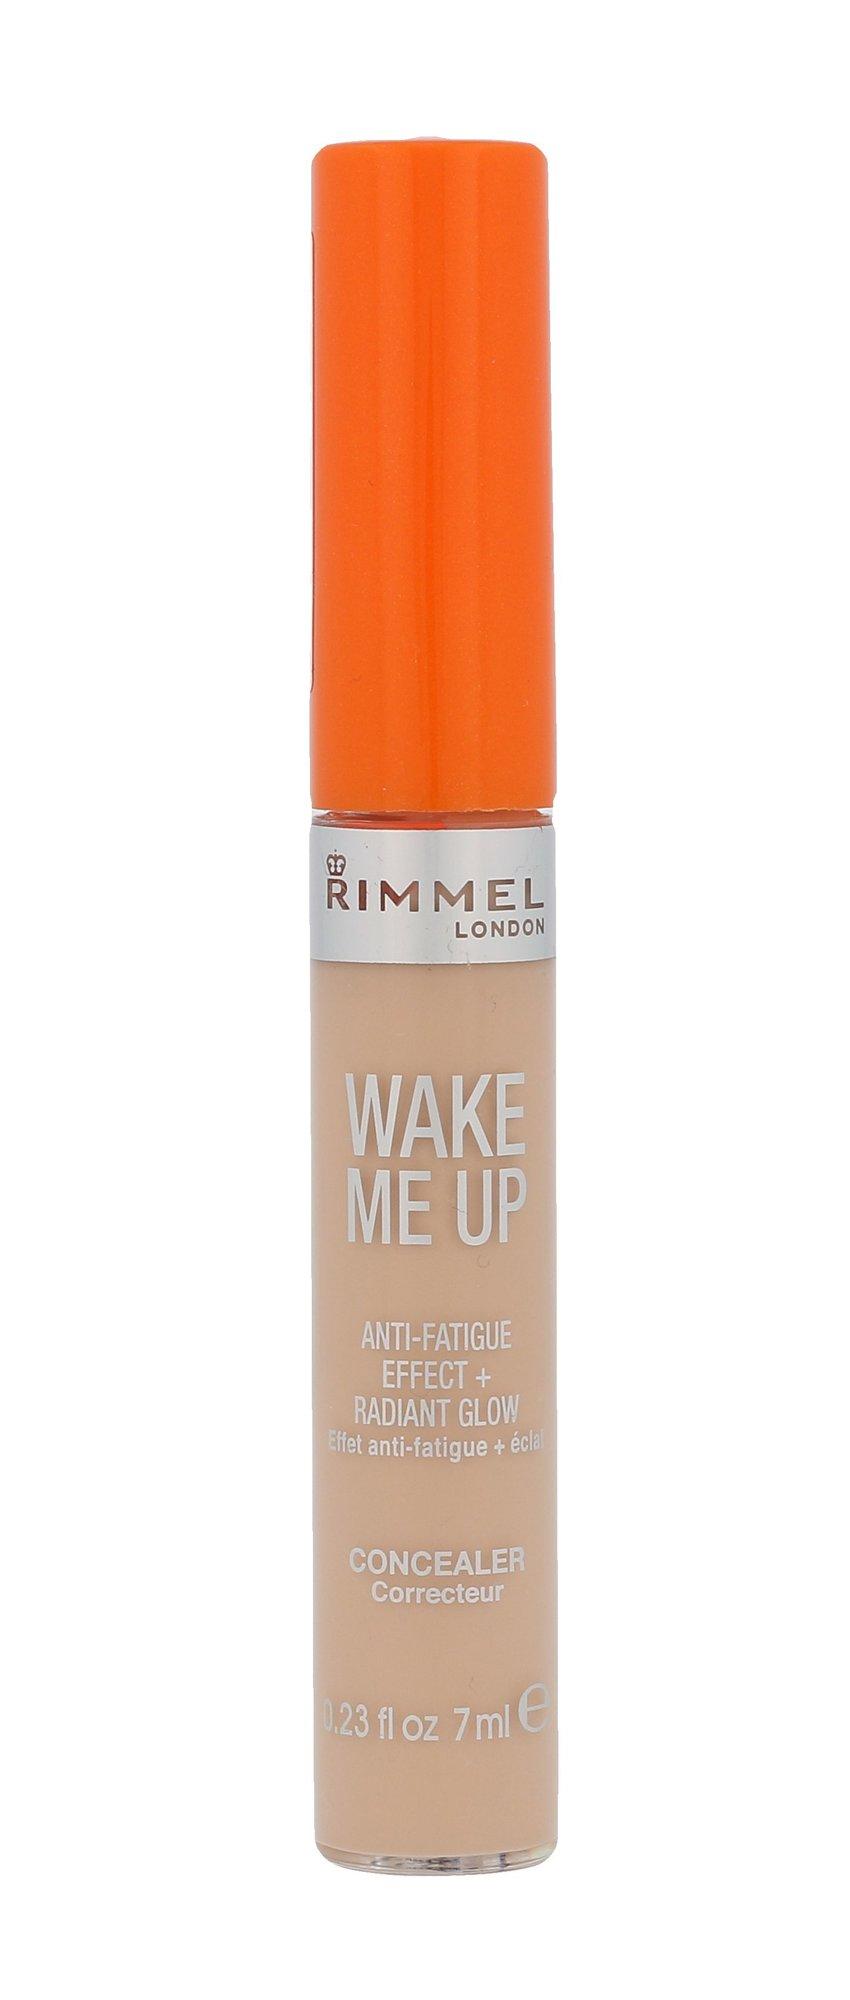 Rimmel London Wake Me Up Cosmetic 7ml 010 Ivory